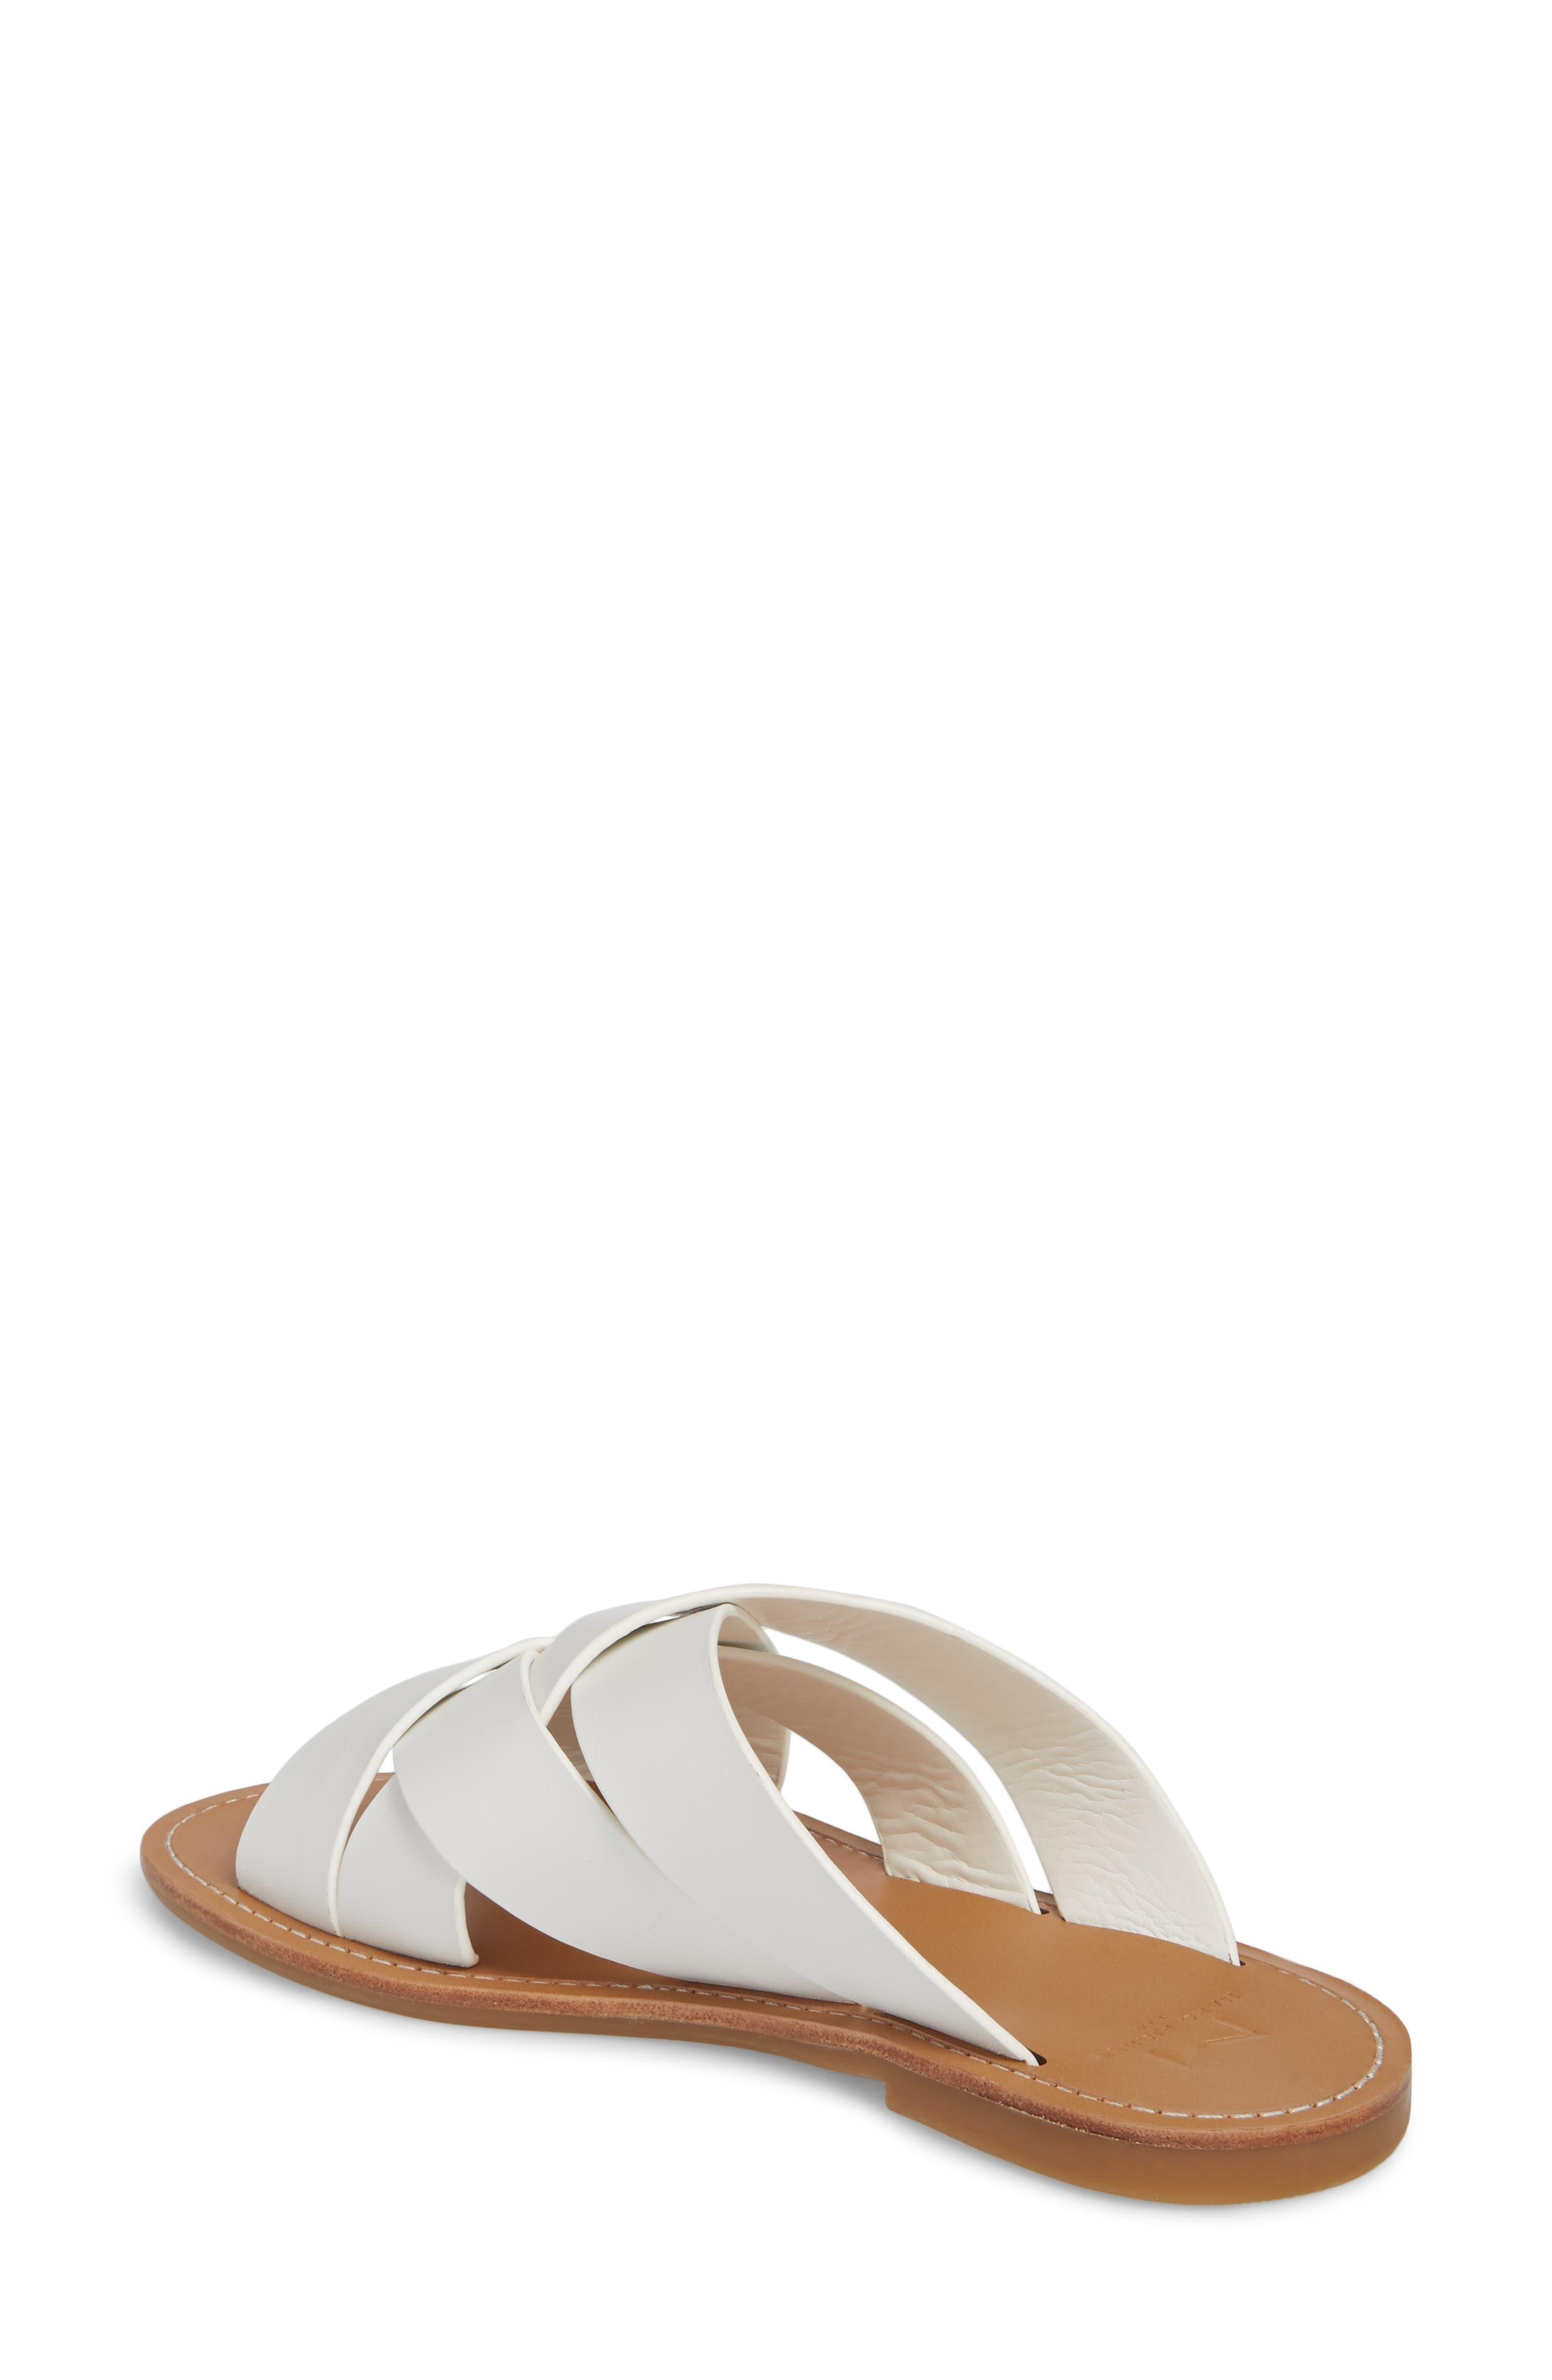 Raida Slide Sandal,                             Alternate thumbnail 2, color,                             White Leather